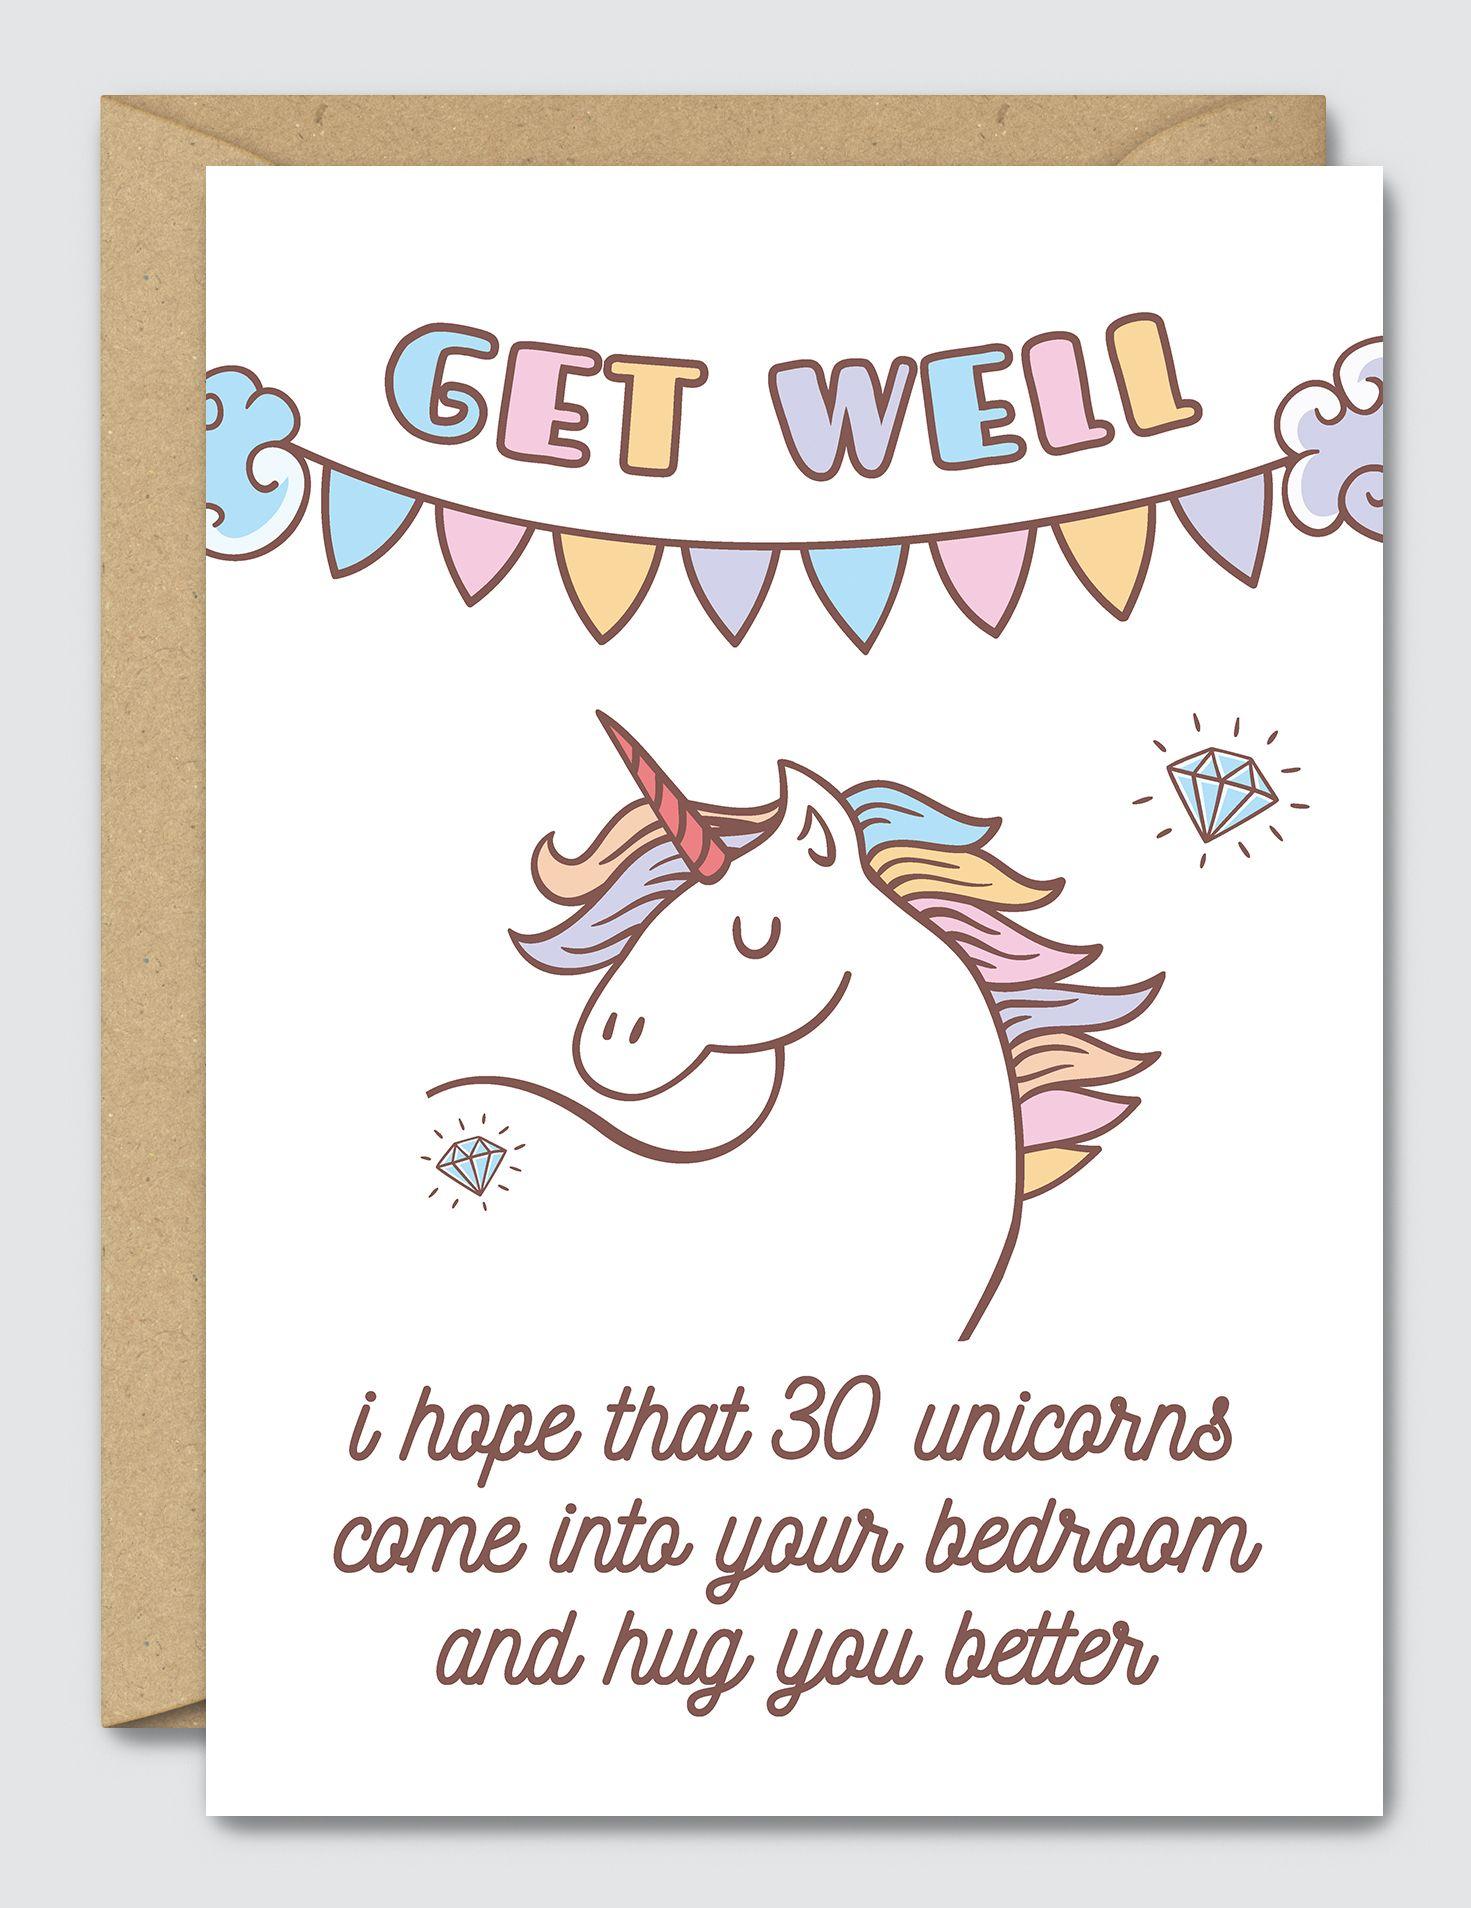 Get well i hope that 30 unicorns hug you better get